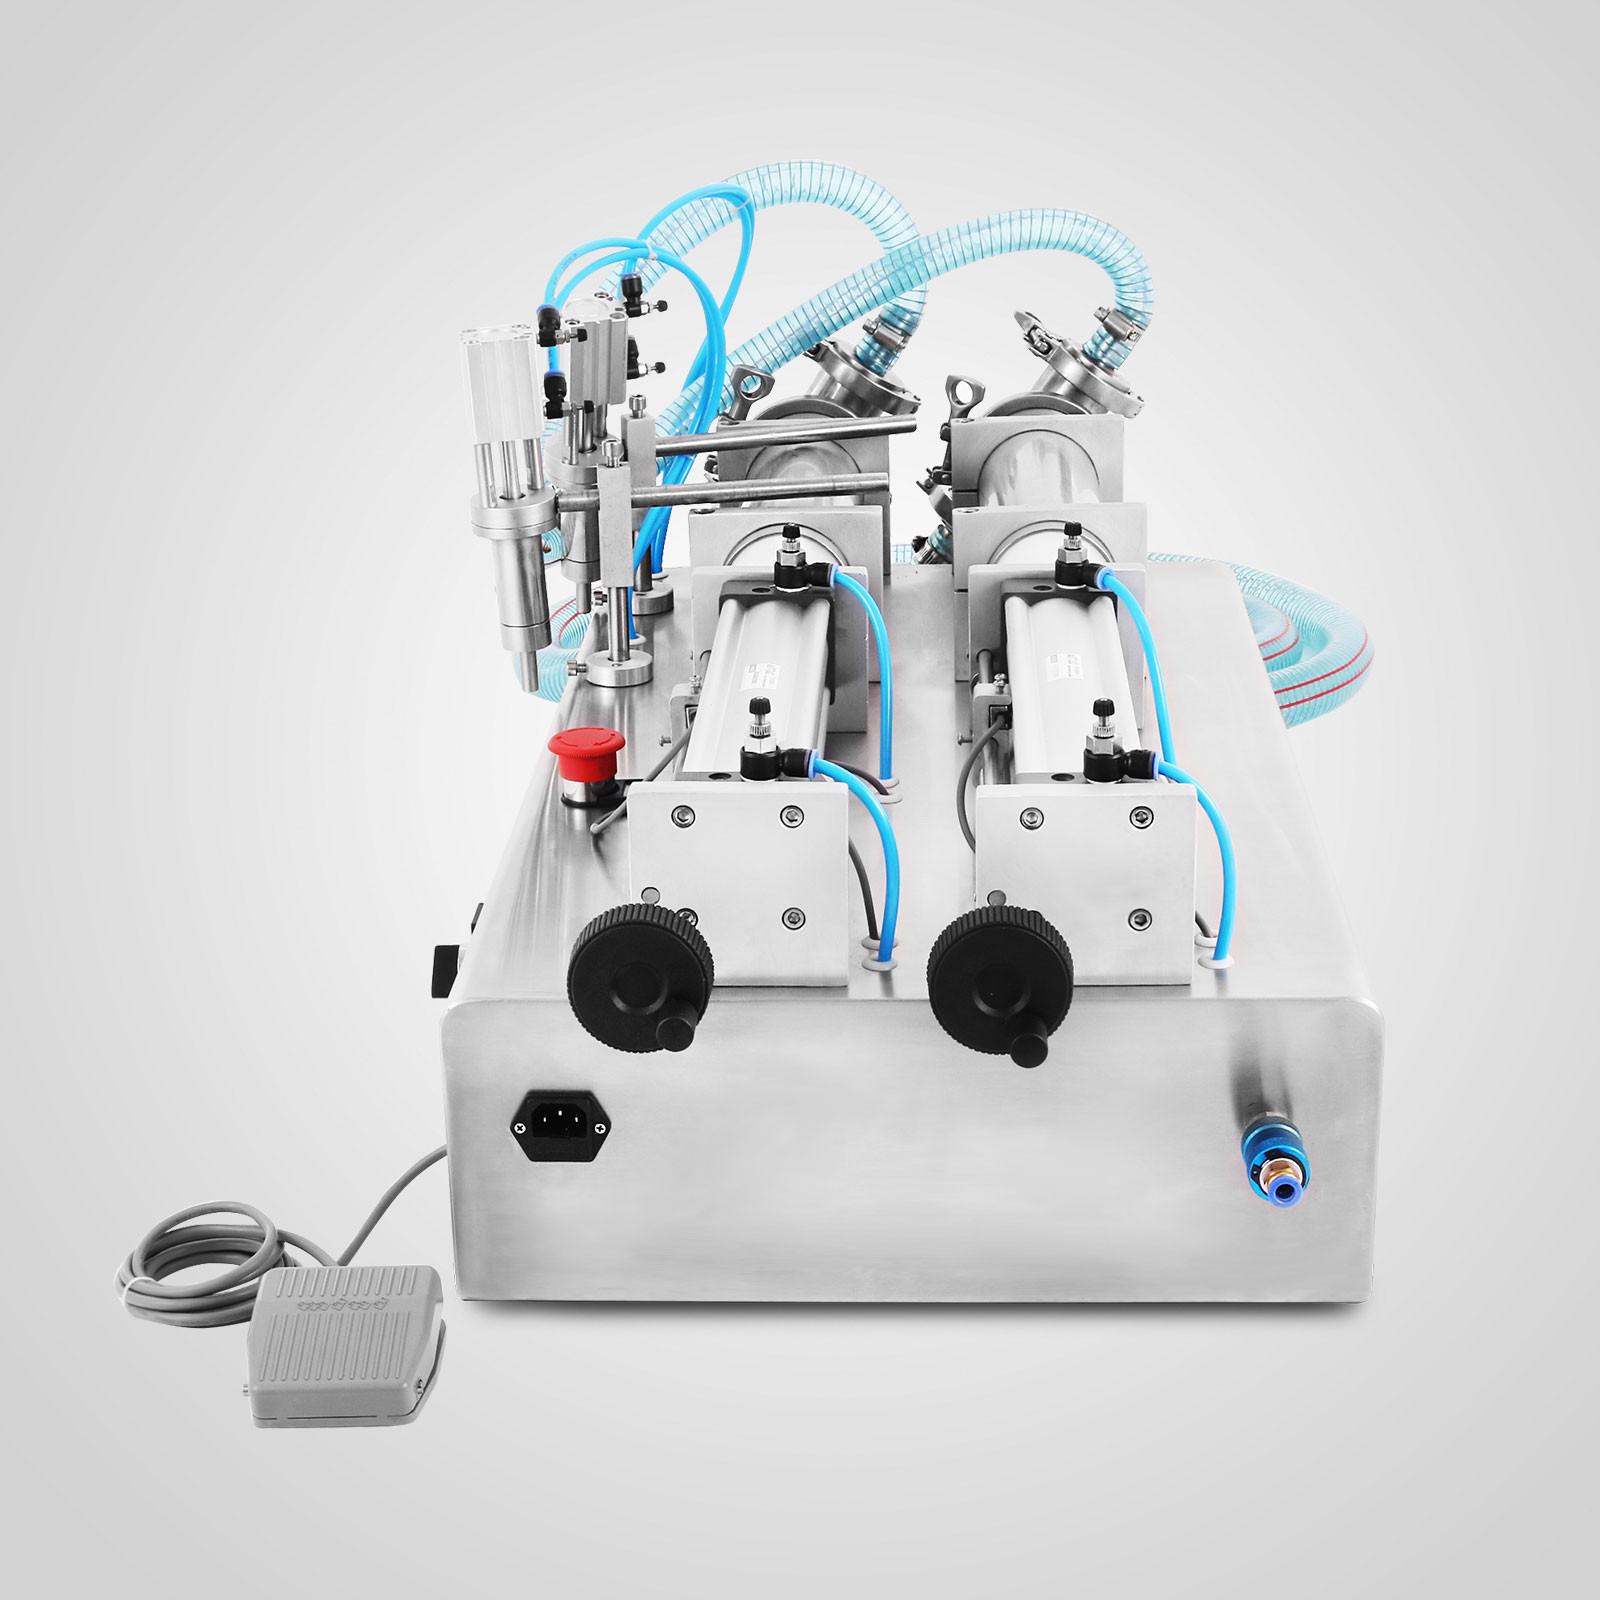 Liquid-Filling-Machine-Filler-Remplissage-2-3500ML-50-500ML-INDUSTRY-SUPPLY miniature 77